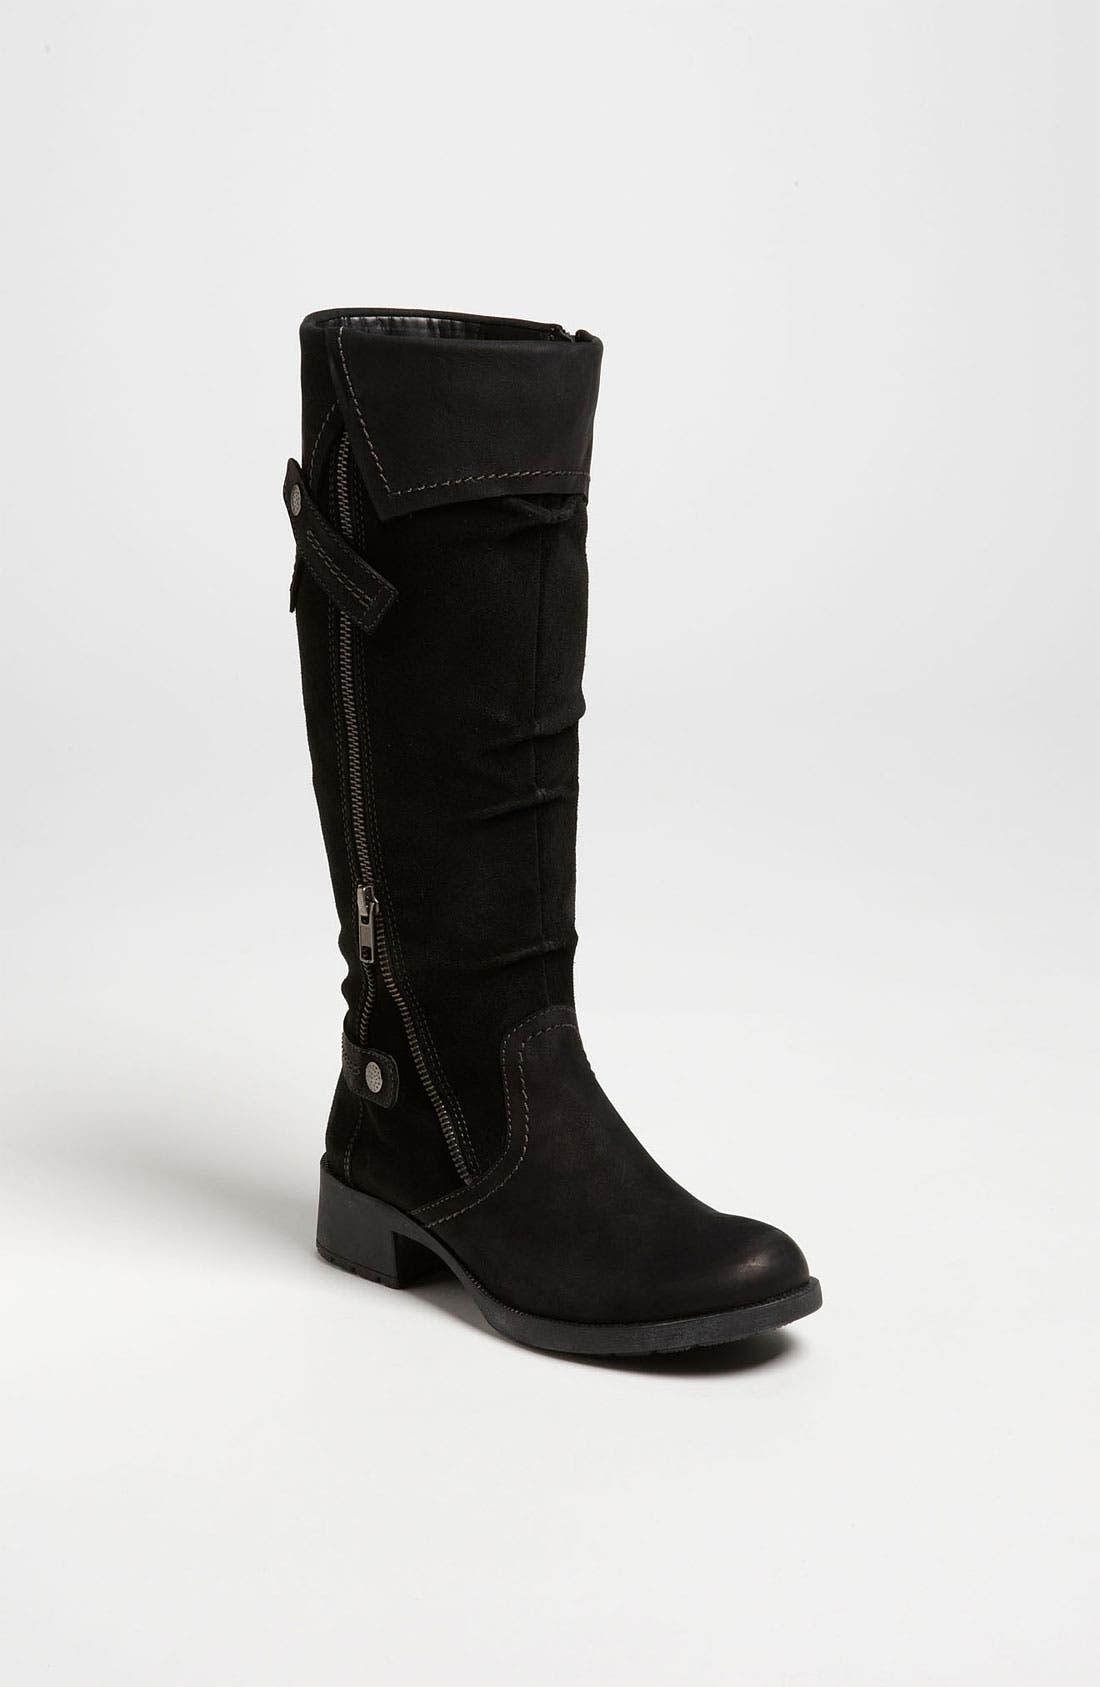 Main Image - Earth® 'Sycamore' Boot